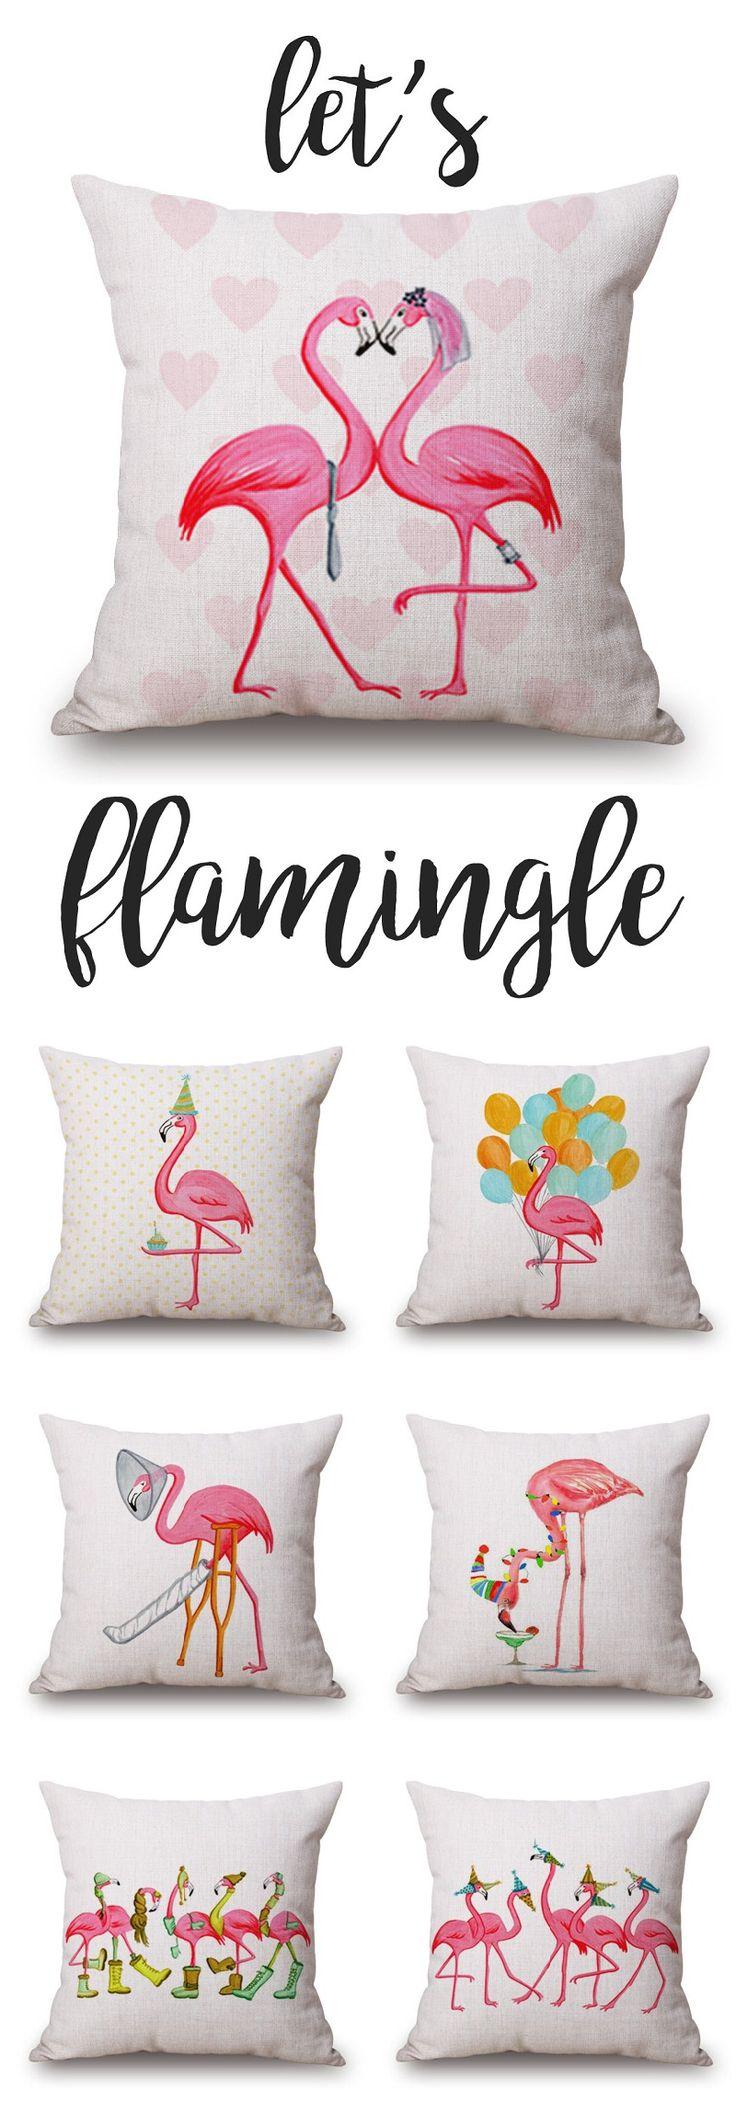 Baby flamingo car interior design - 45x45cm Christmas Flamingo Linen Pillow Case Cushion Cover Bags Home Car Decor